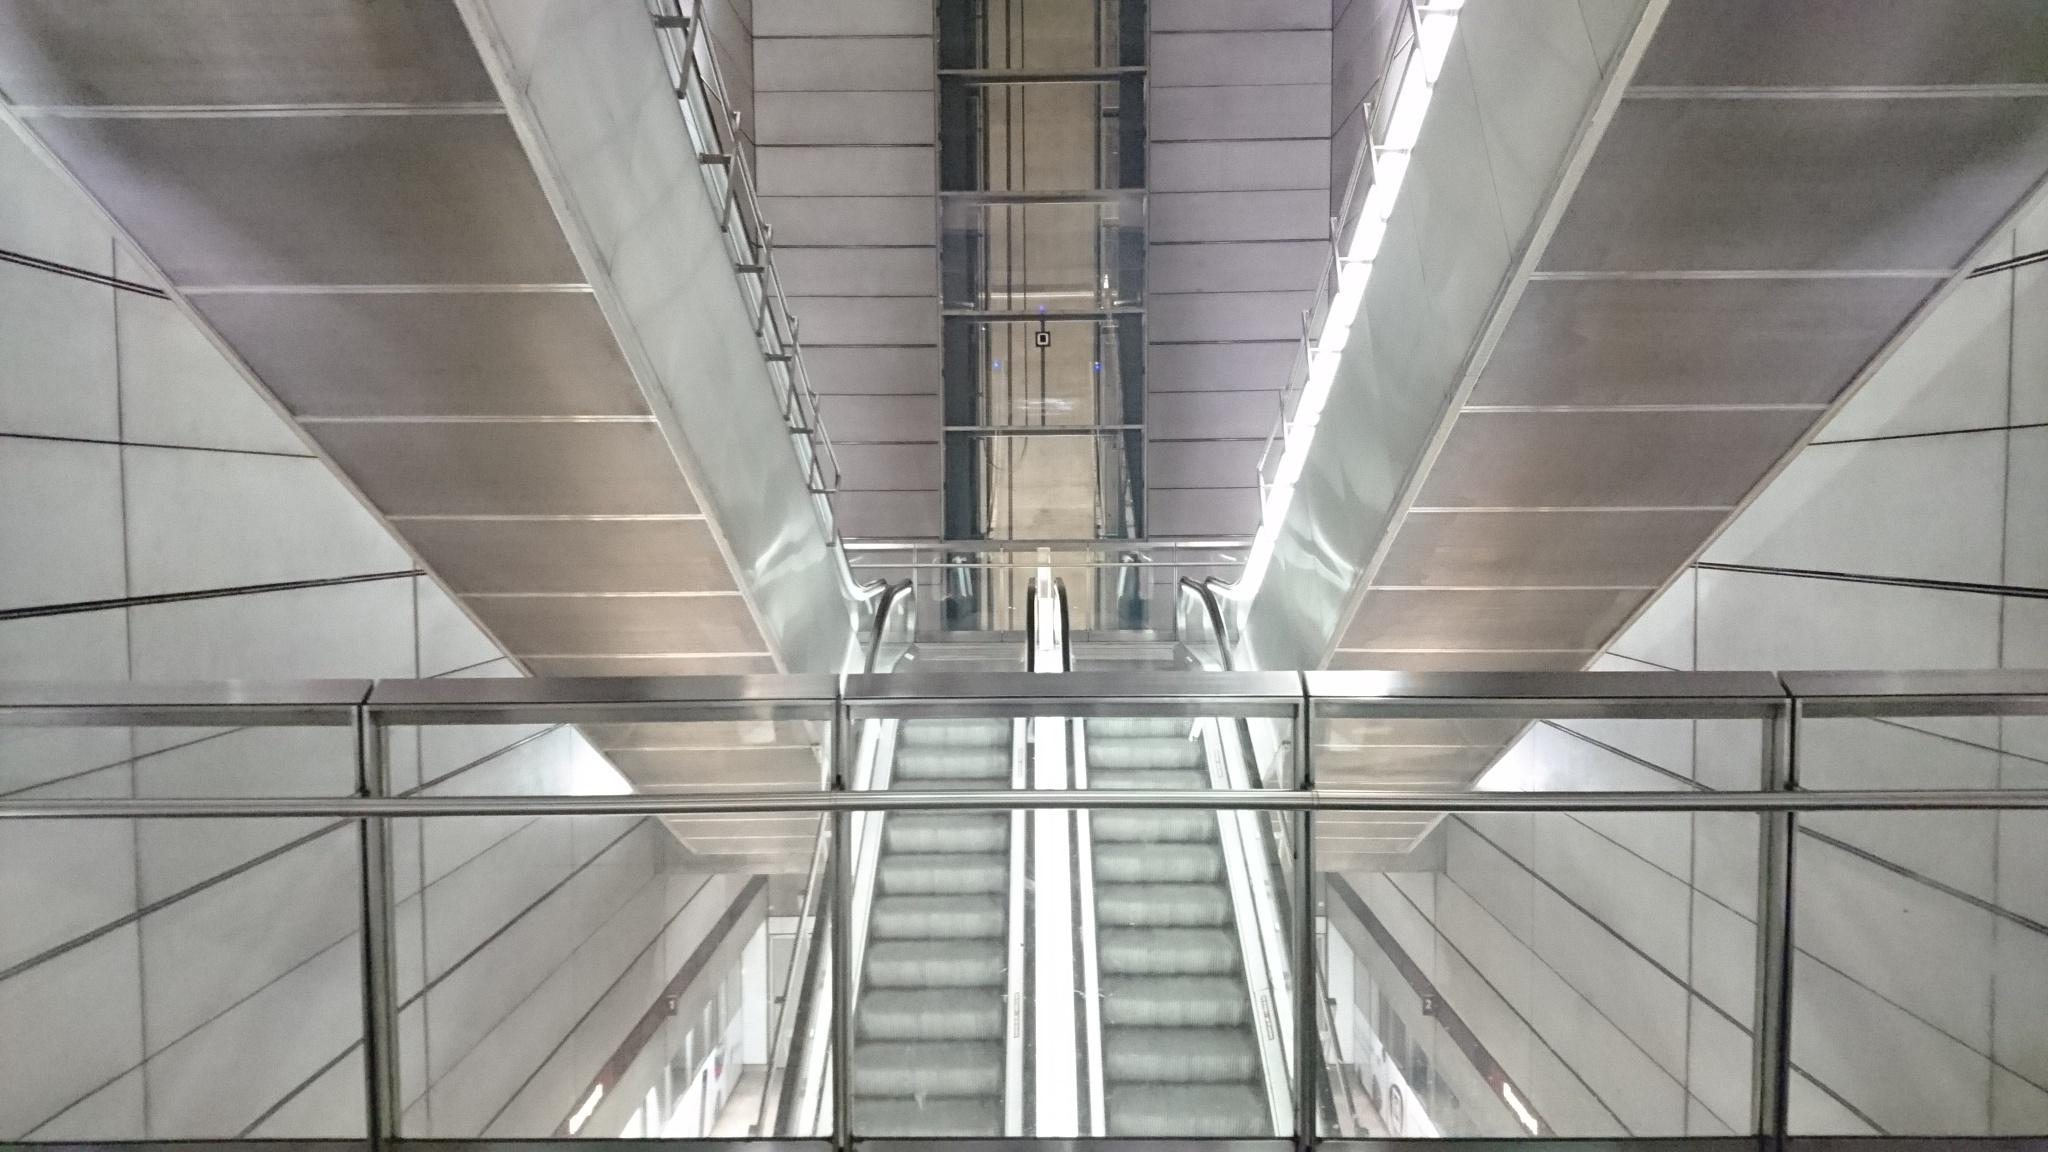 Escalators 2 by Pia Löfgren